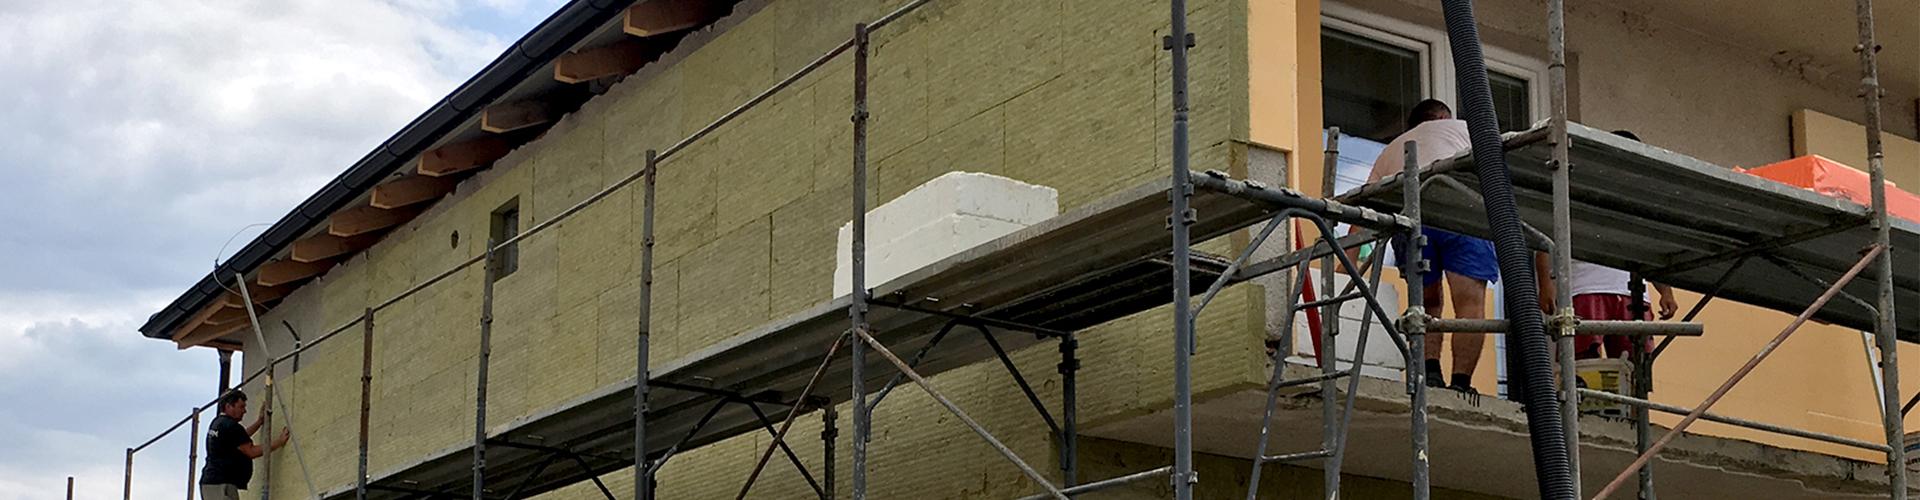 Zateplenie, nová strecha